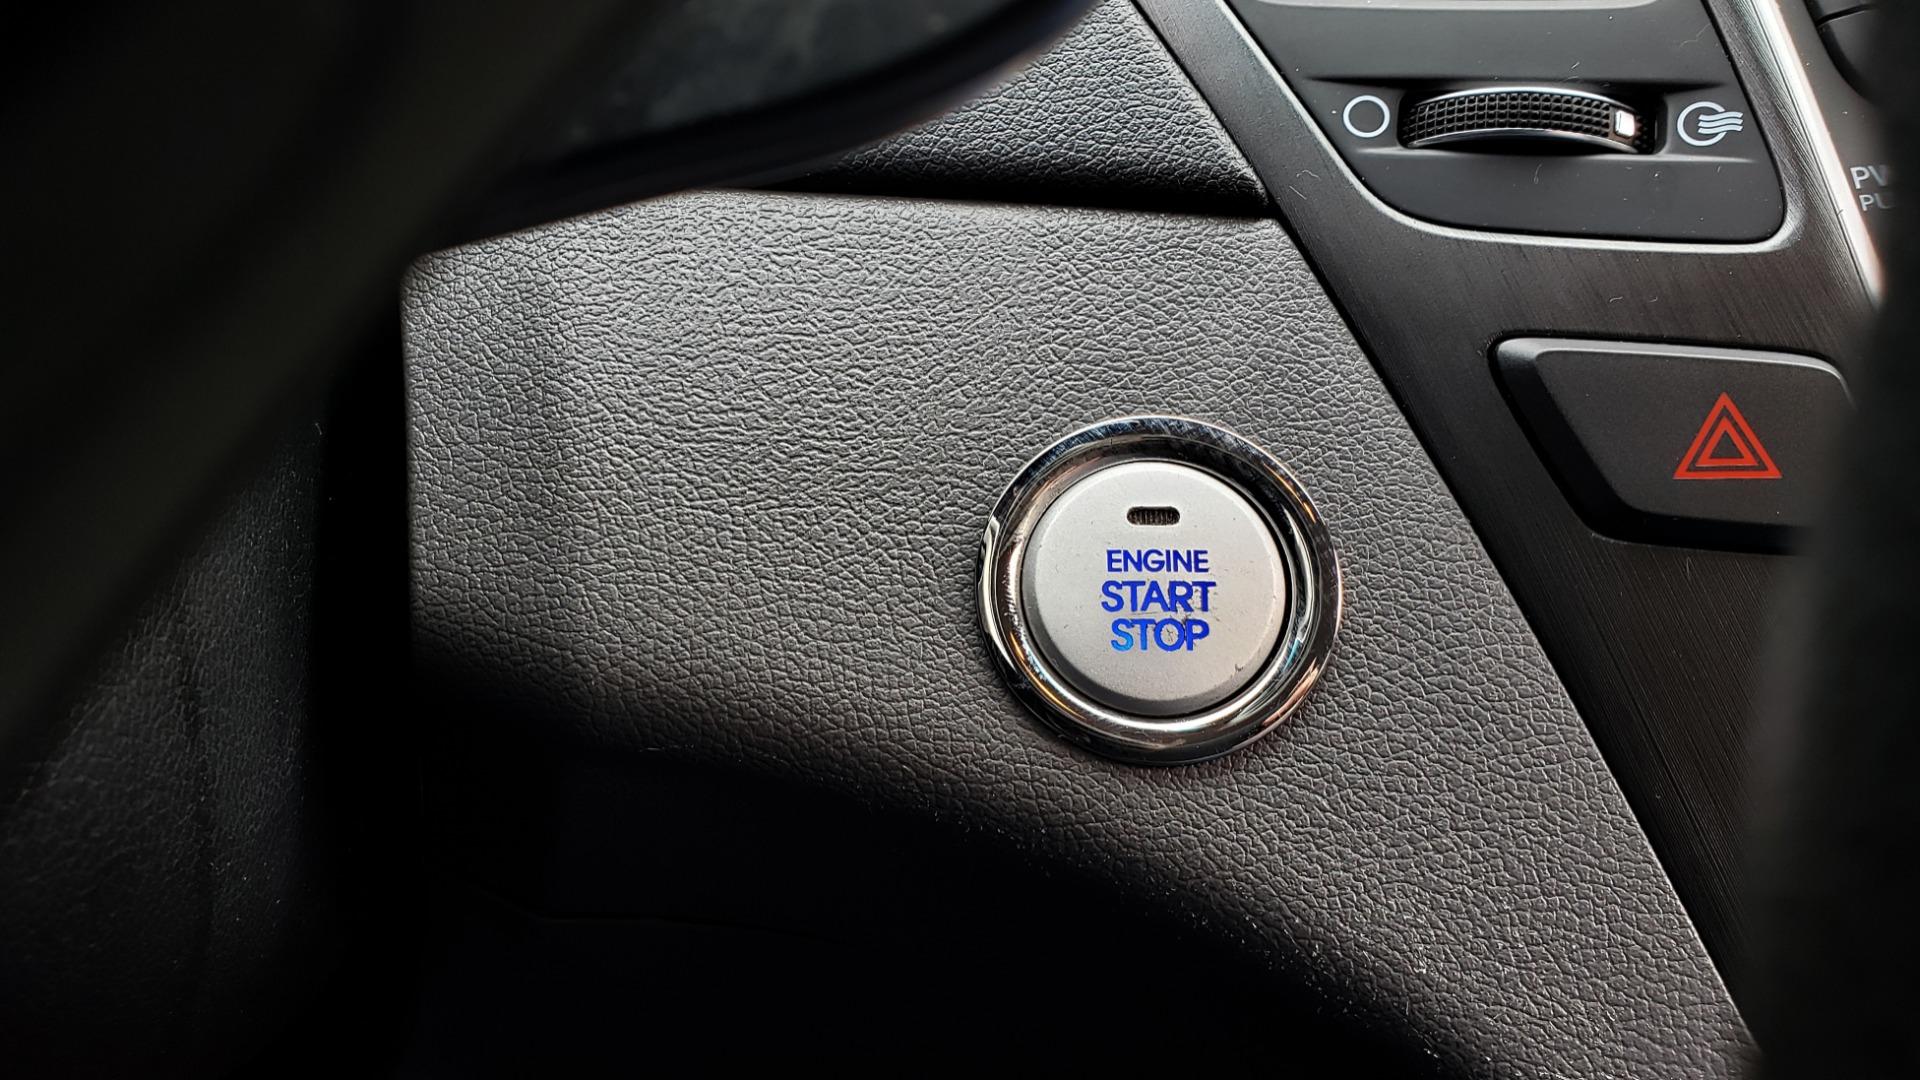 Used 2013 Hyundai SONATA SE AUTO / 2.4L 4-CYL / 6-SPD AUTO / VERY CLEAN for sale Sold at Formula Imports in Charlotte NC 28227 41